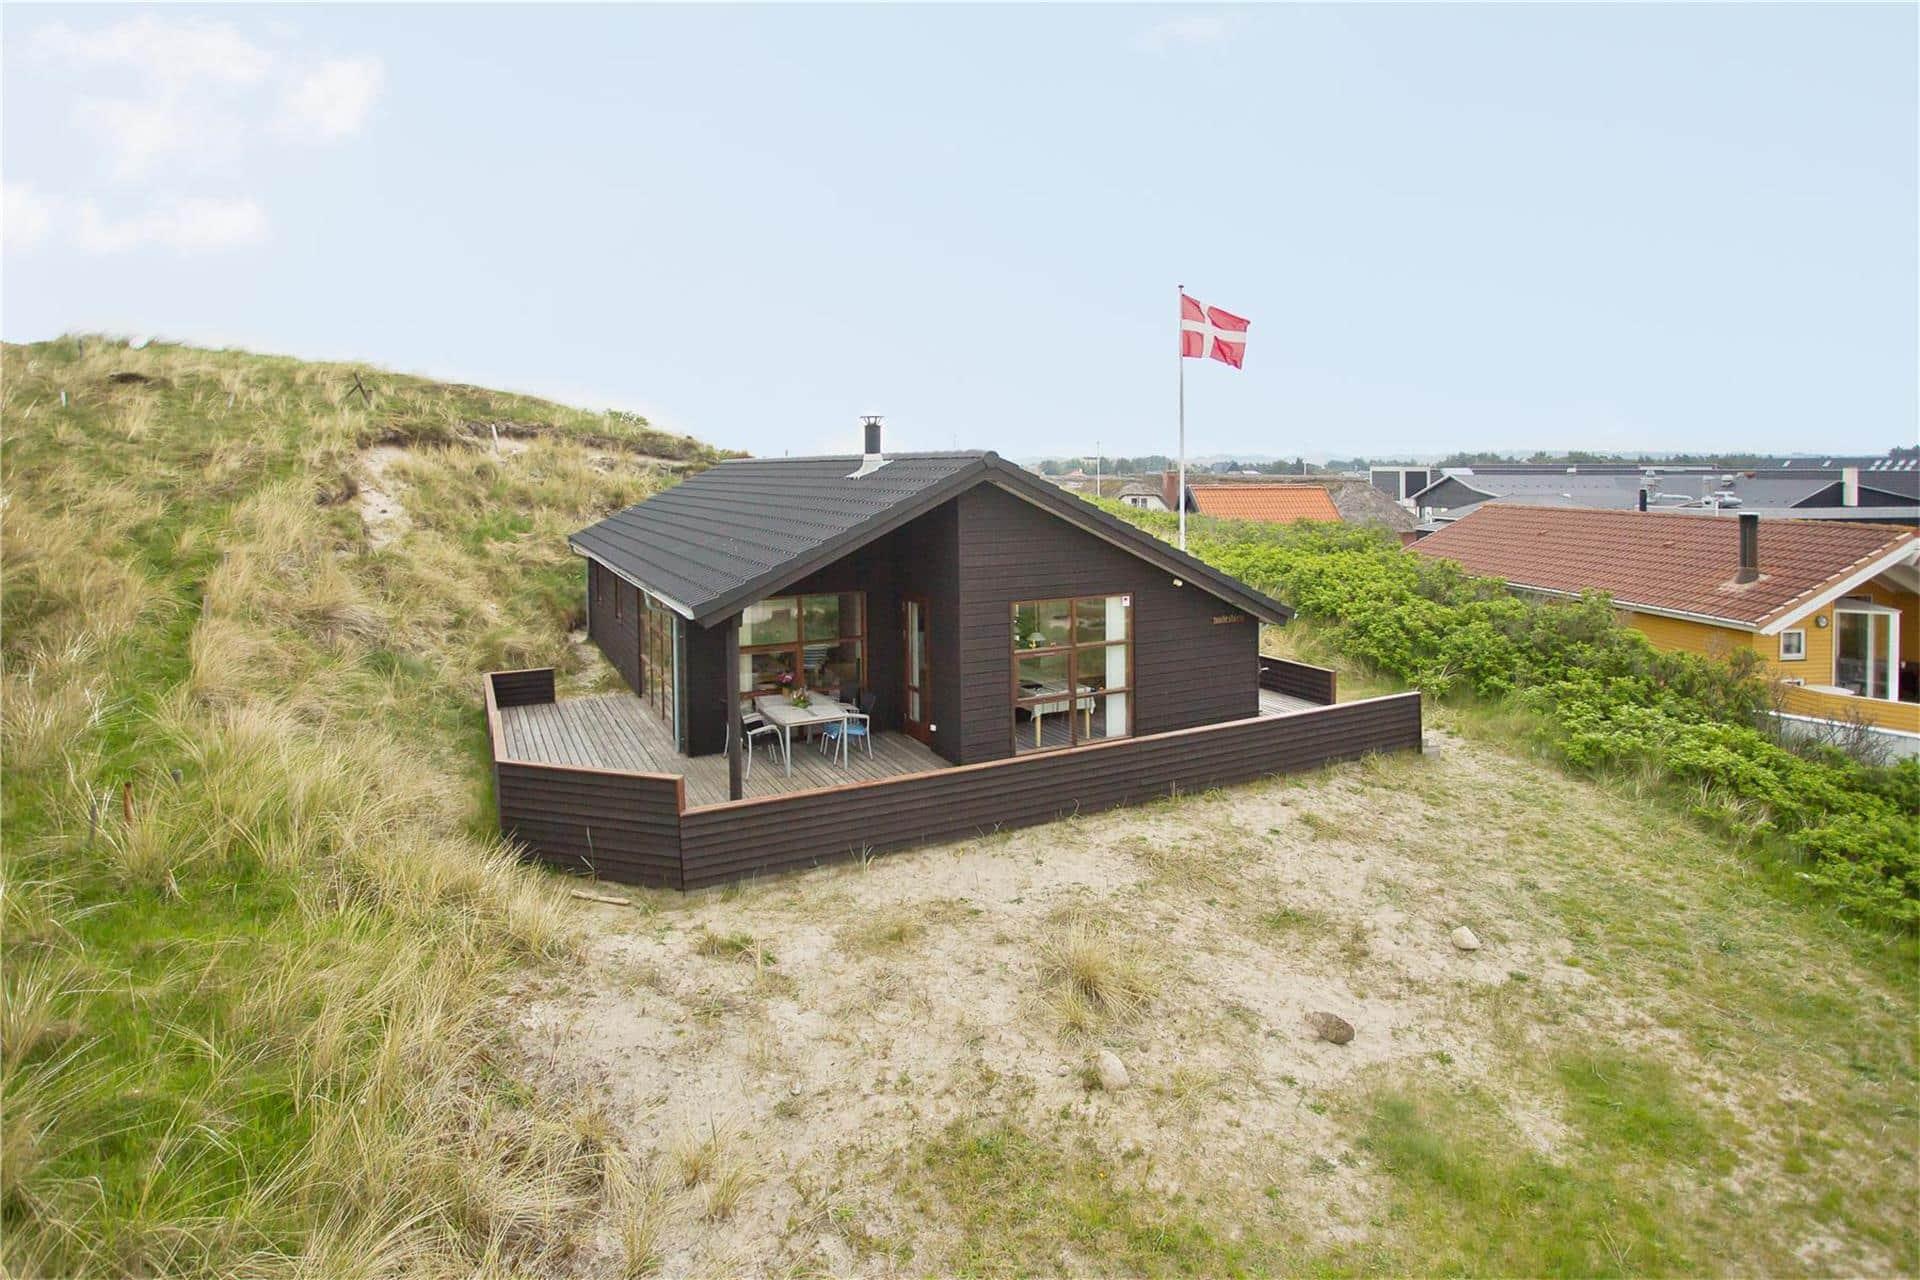 Image 1-125 Holiday-home 2120, Gyvelvej 20, DK - 6854 Henne